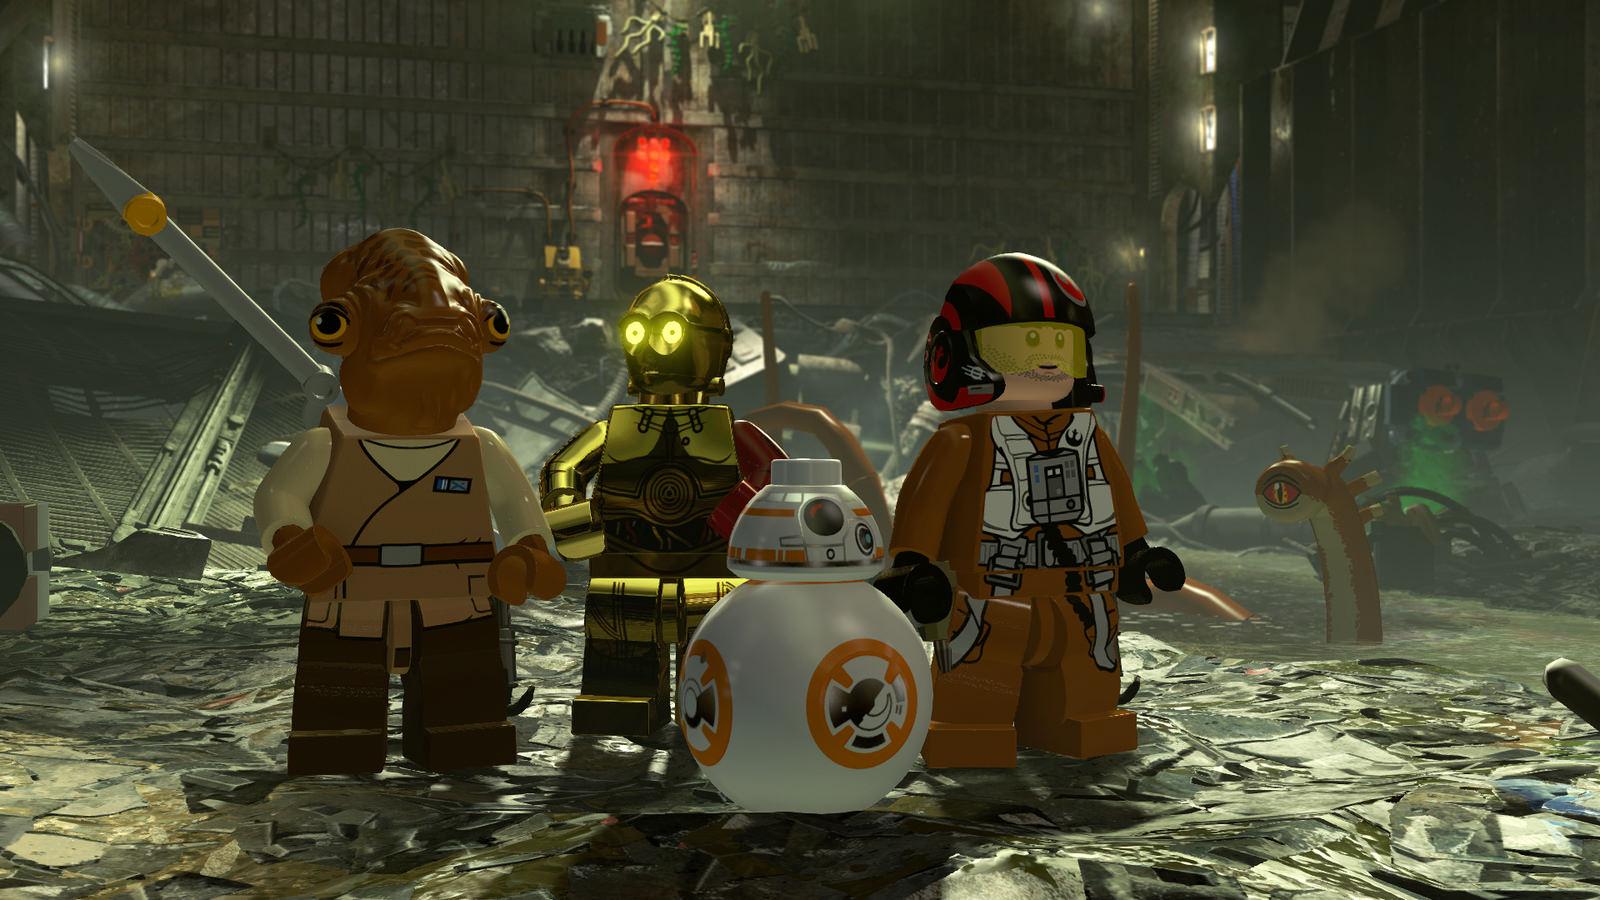 Lego Star Wars The Force Awakens Stars Harrison Ford